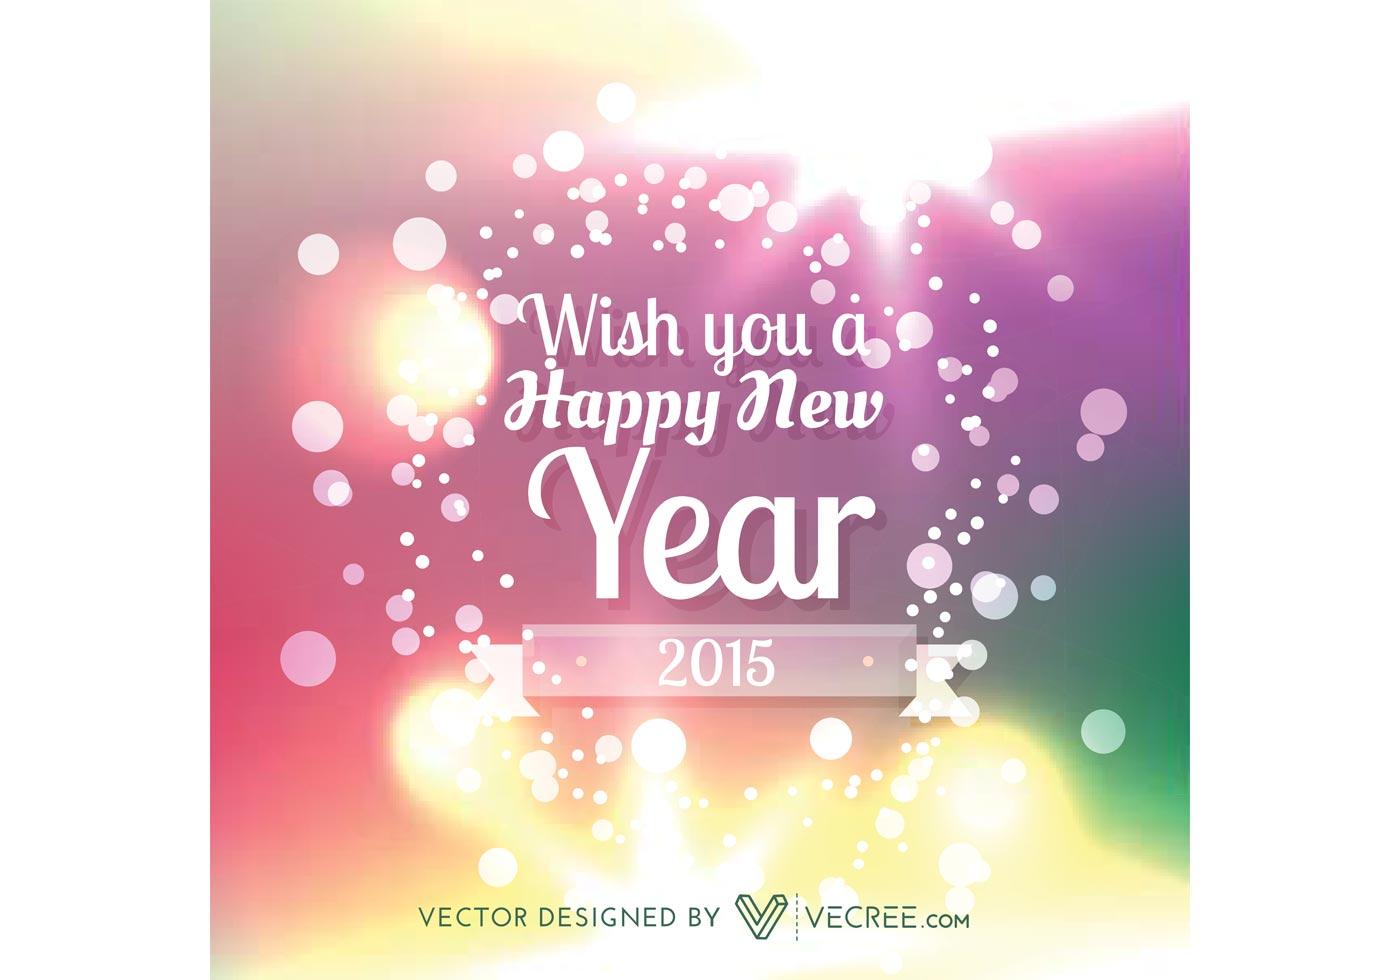 Happy New Year Vector Background Free Vector Art At Vecteezy